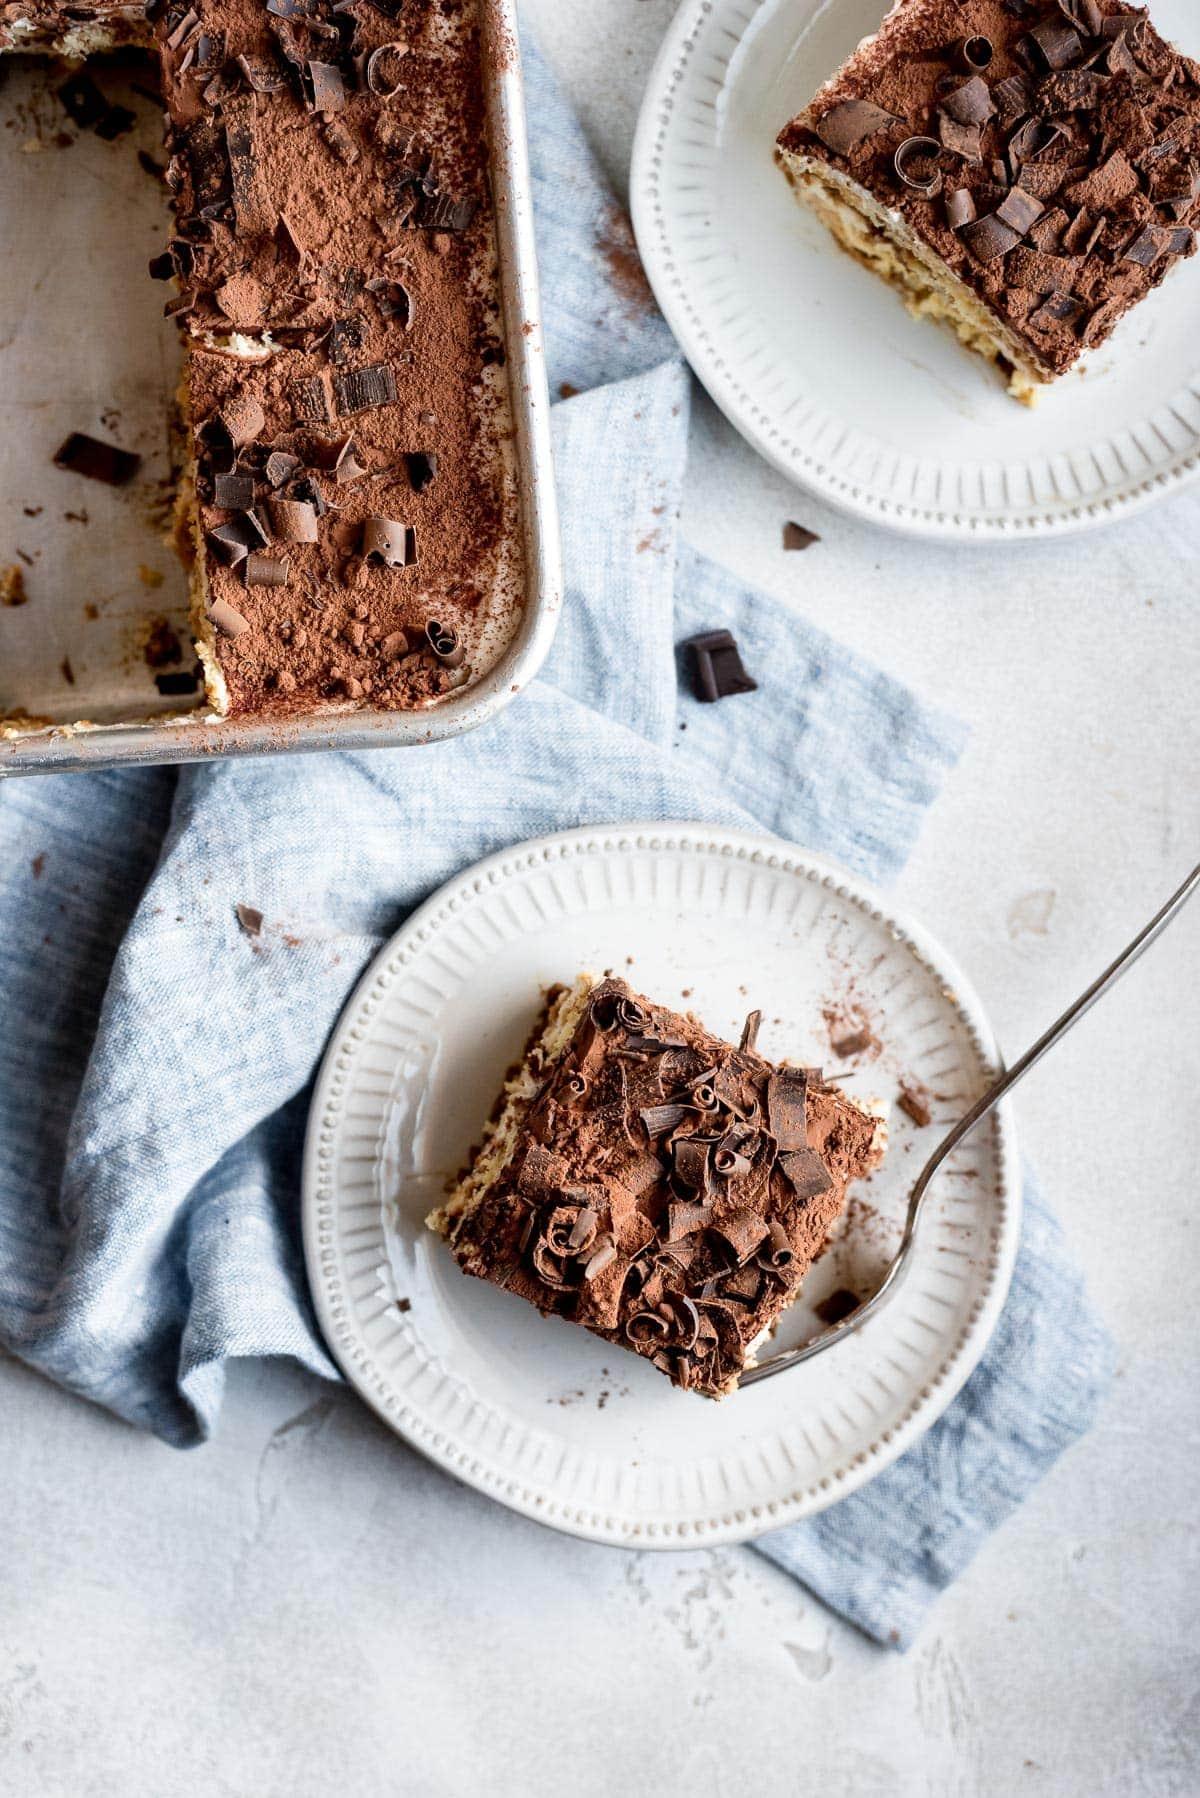 pverheat pan and plate both filled with the tiramisu cake